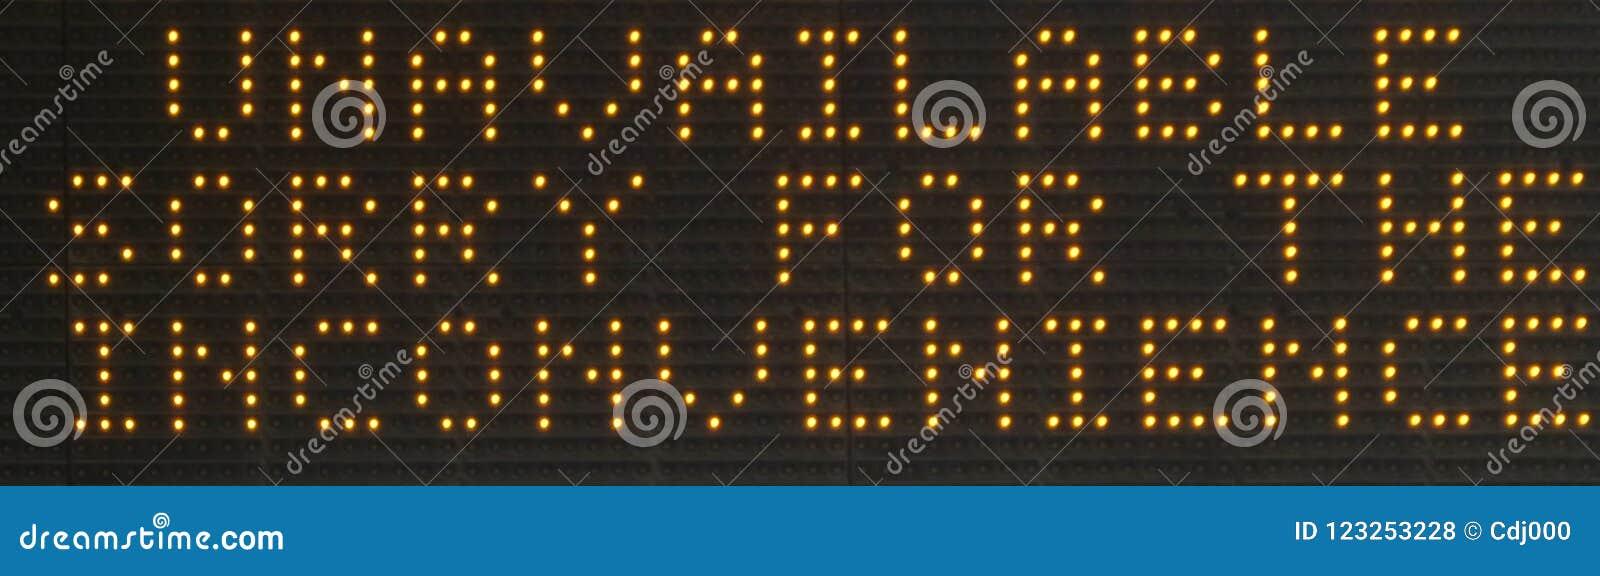 `Unavailable` LED dot matrix sign display